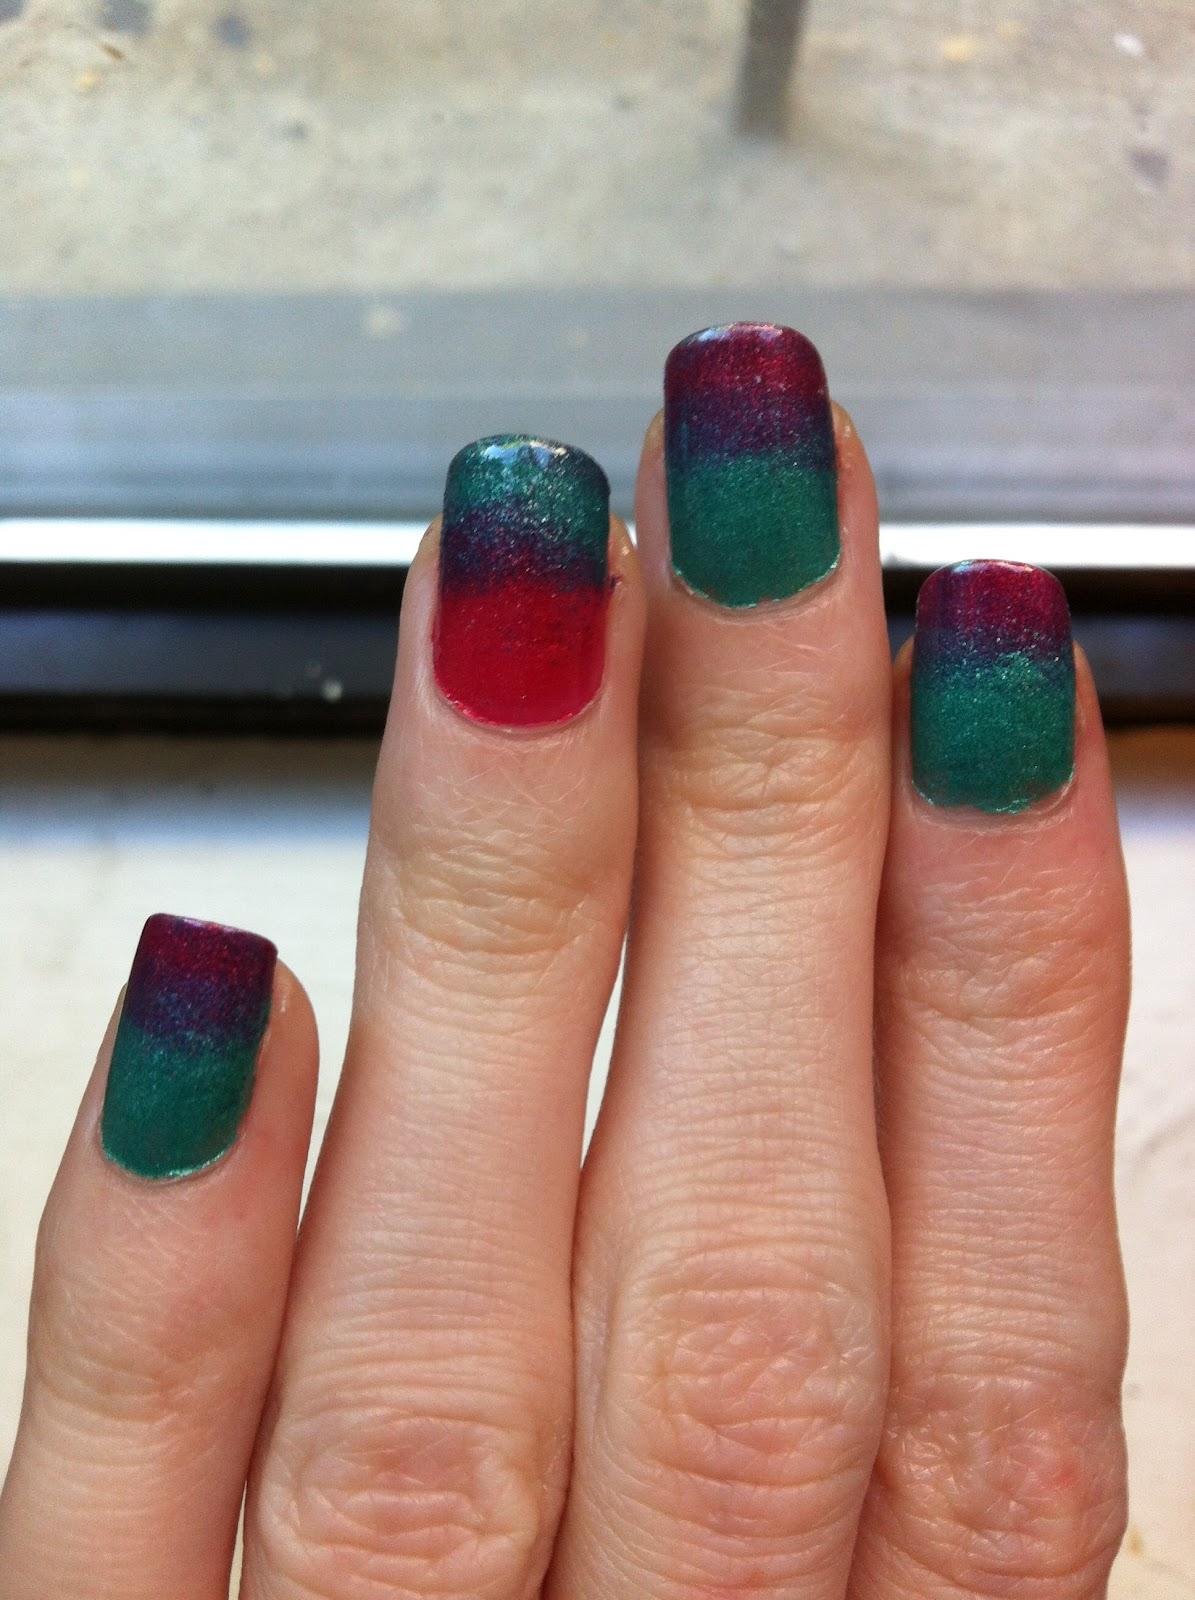 Evlady: Summer Gradient Nails